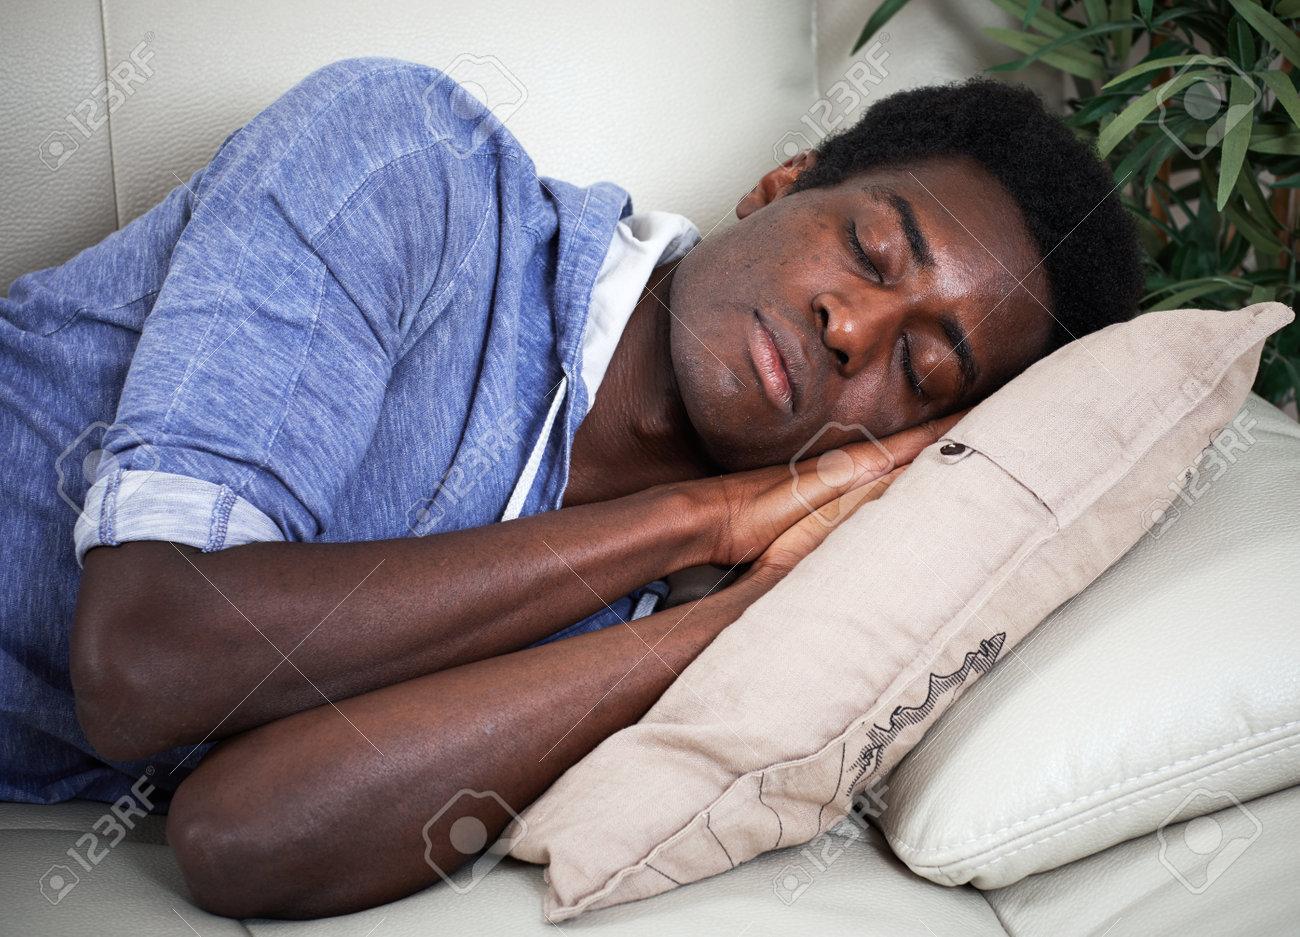 Man sleeping movies pics 93